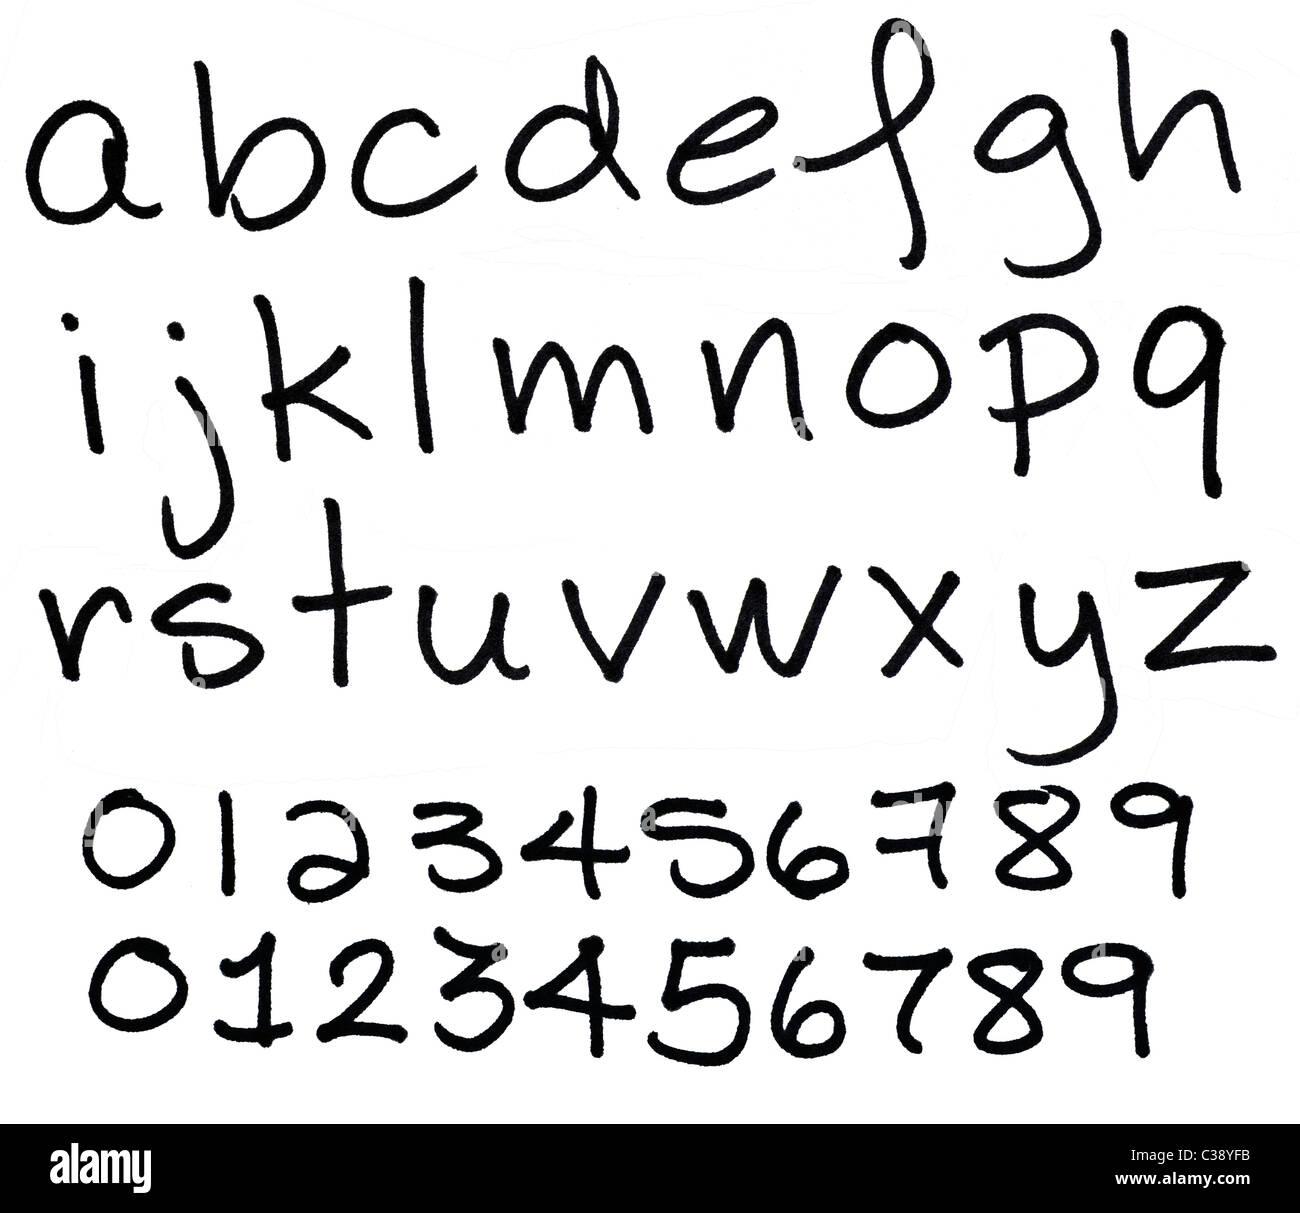 Alphabet black ink letters - Stock Image